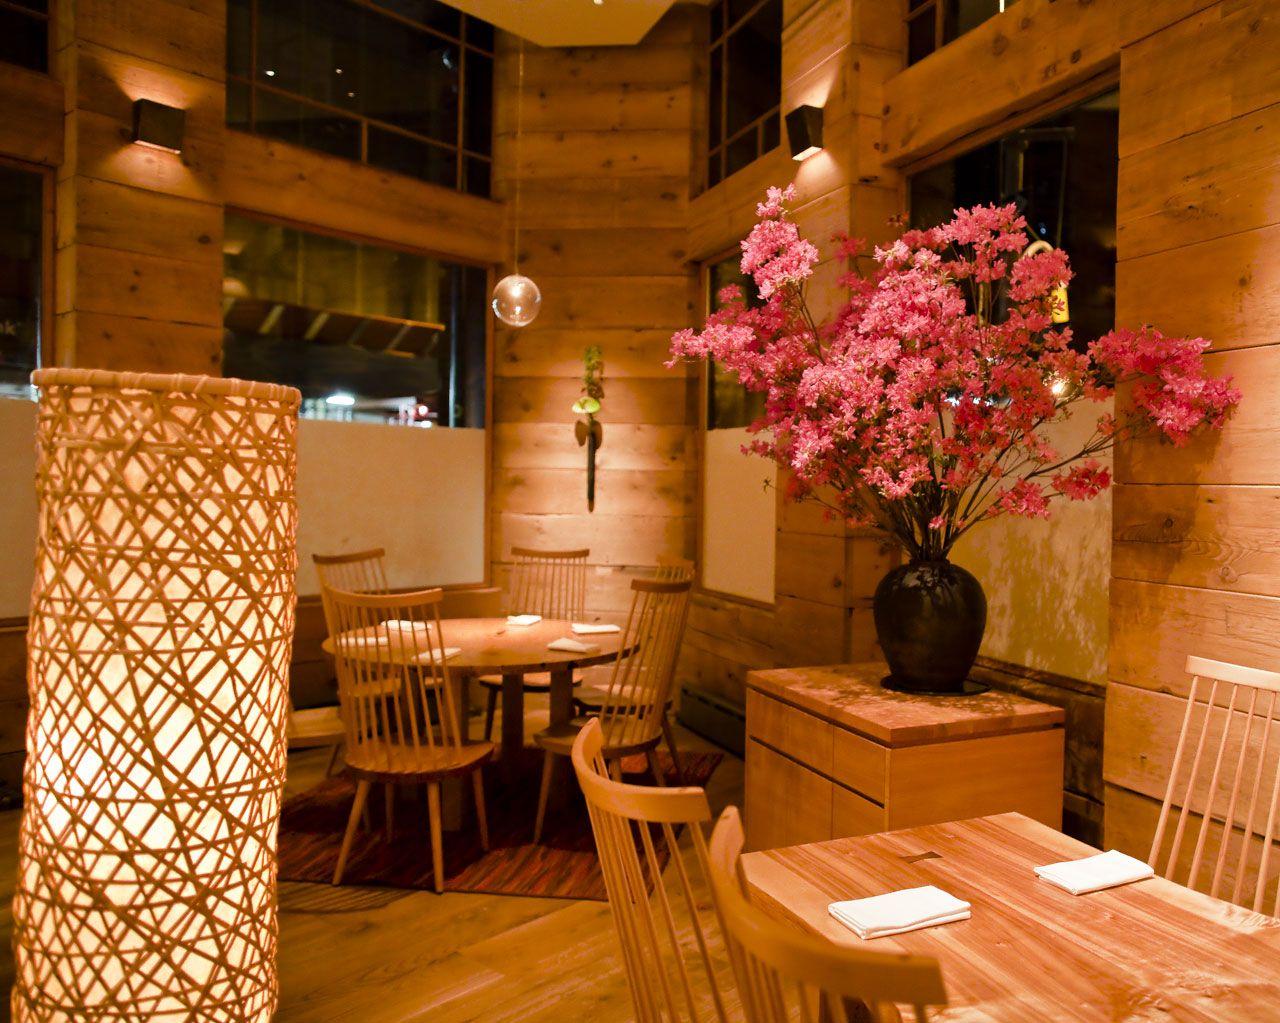 Httpwwwdavidbouleybouleyrestaurantwpcontentuploads New Private Dining Room Nyc Design Inspiration